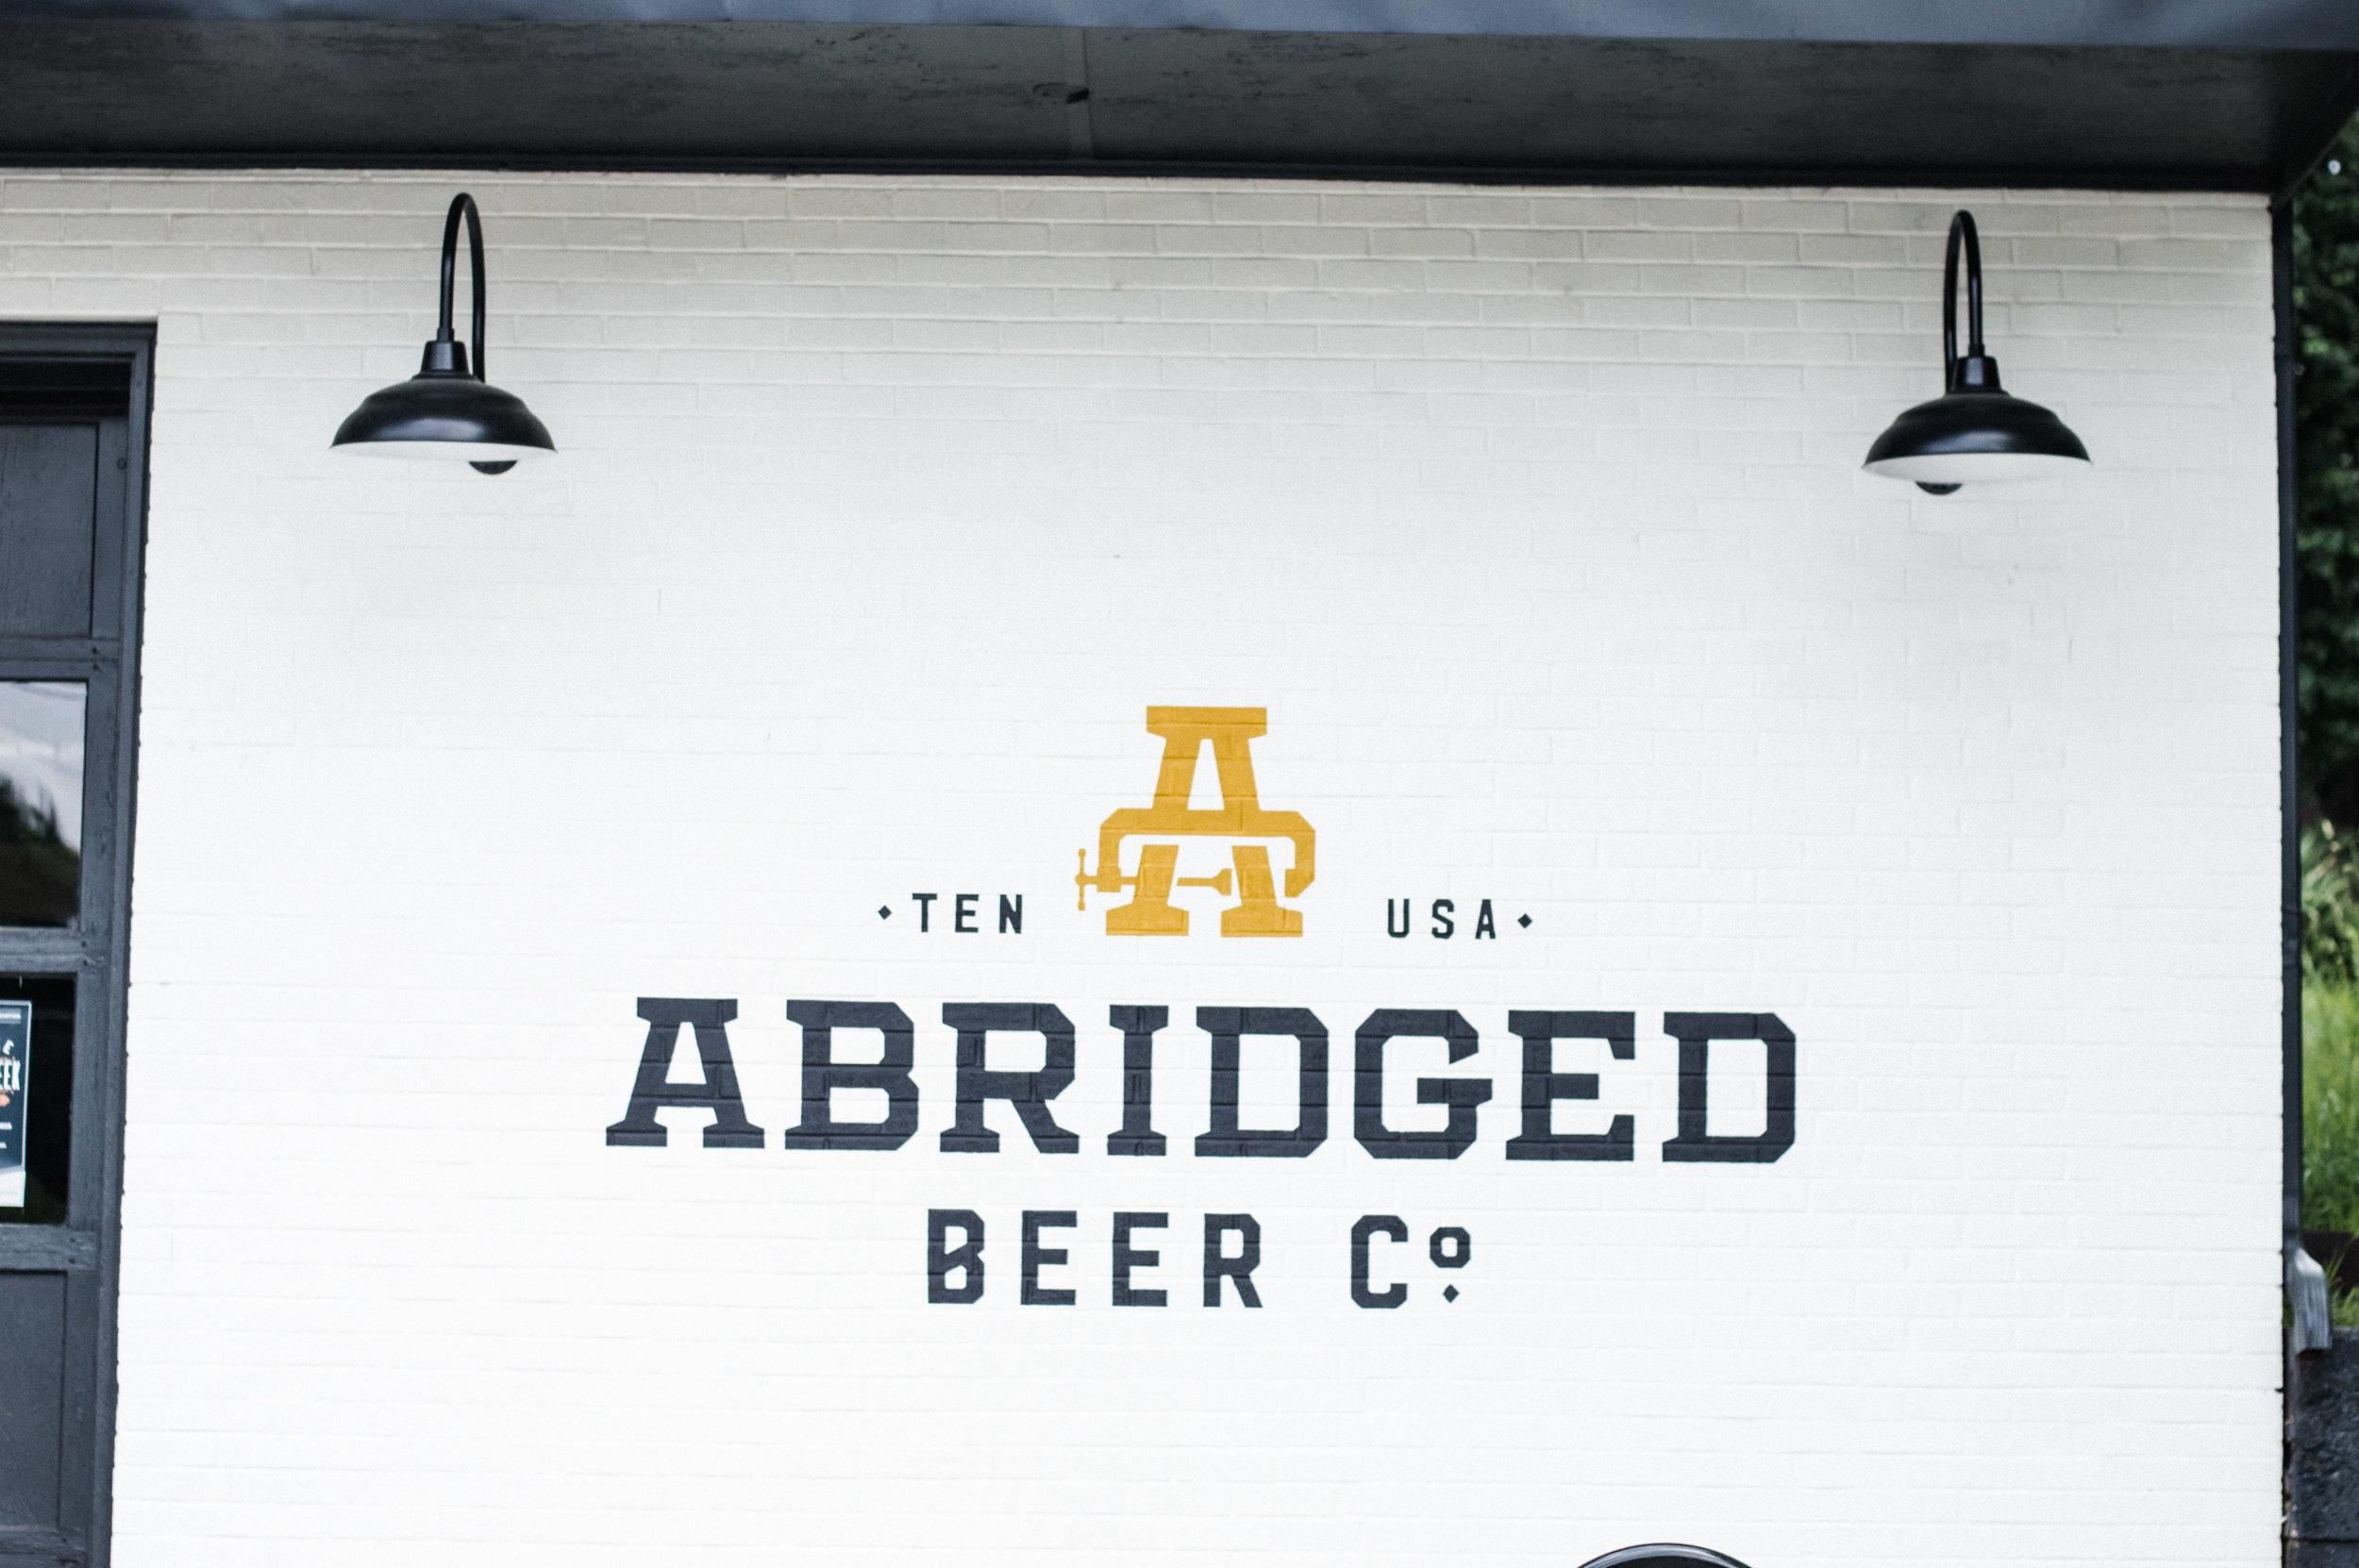 Abridged Beer Co.